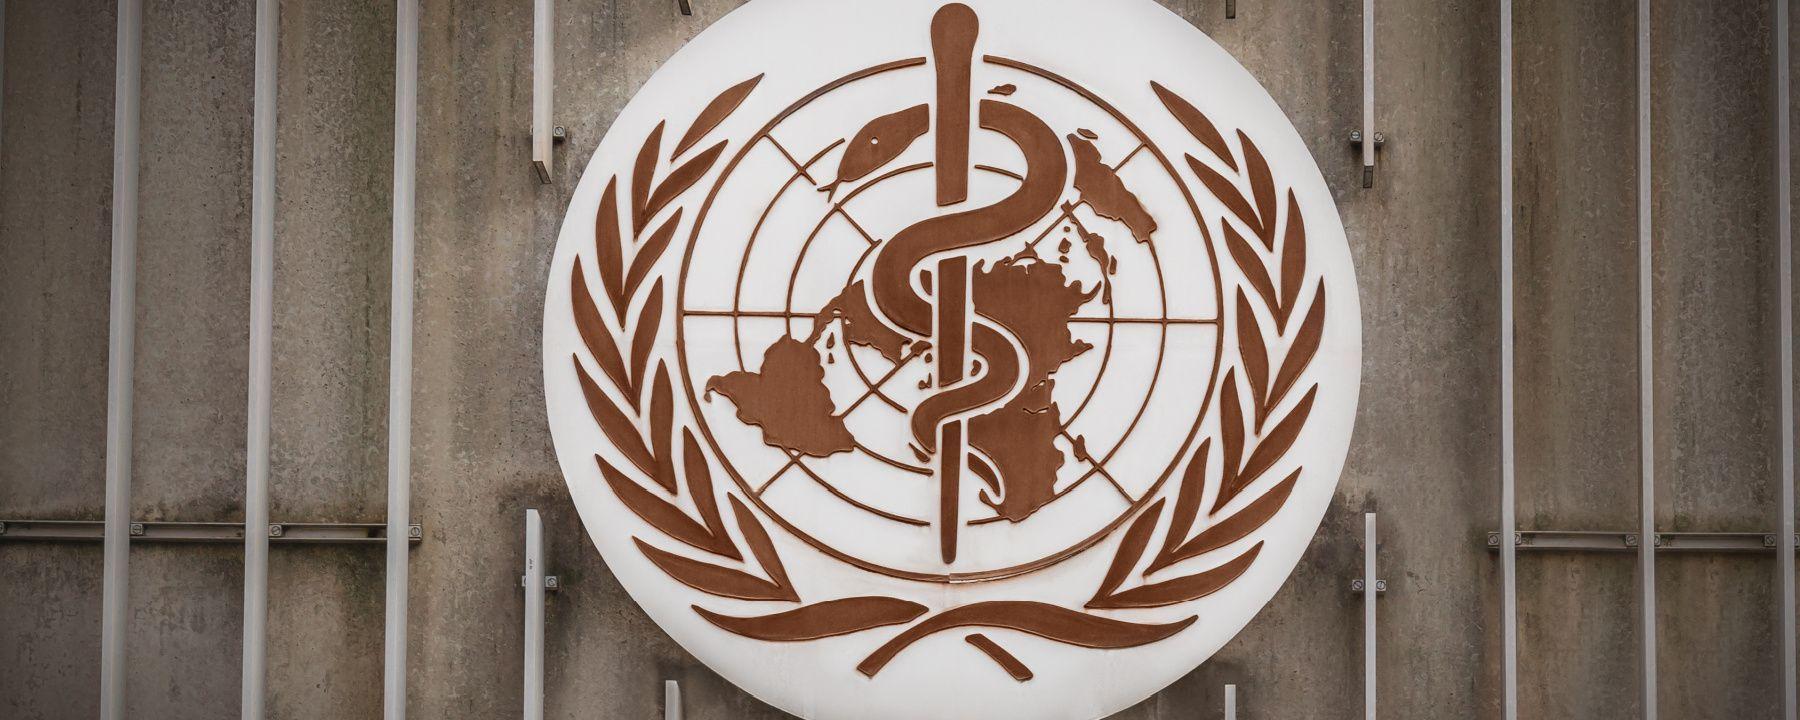 Interim Report on Origin of SARS-CoV-2 Scrapped by WHO